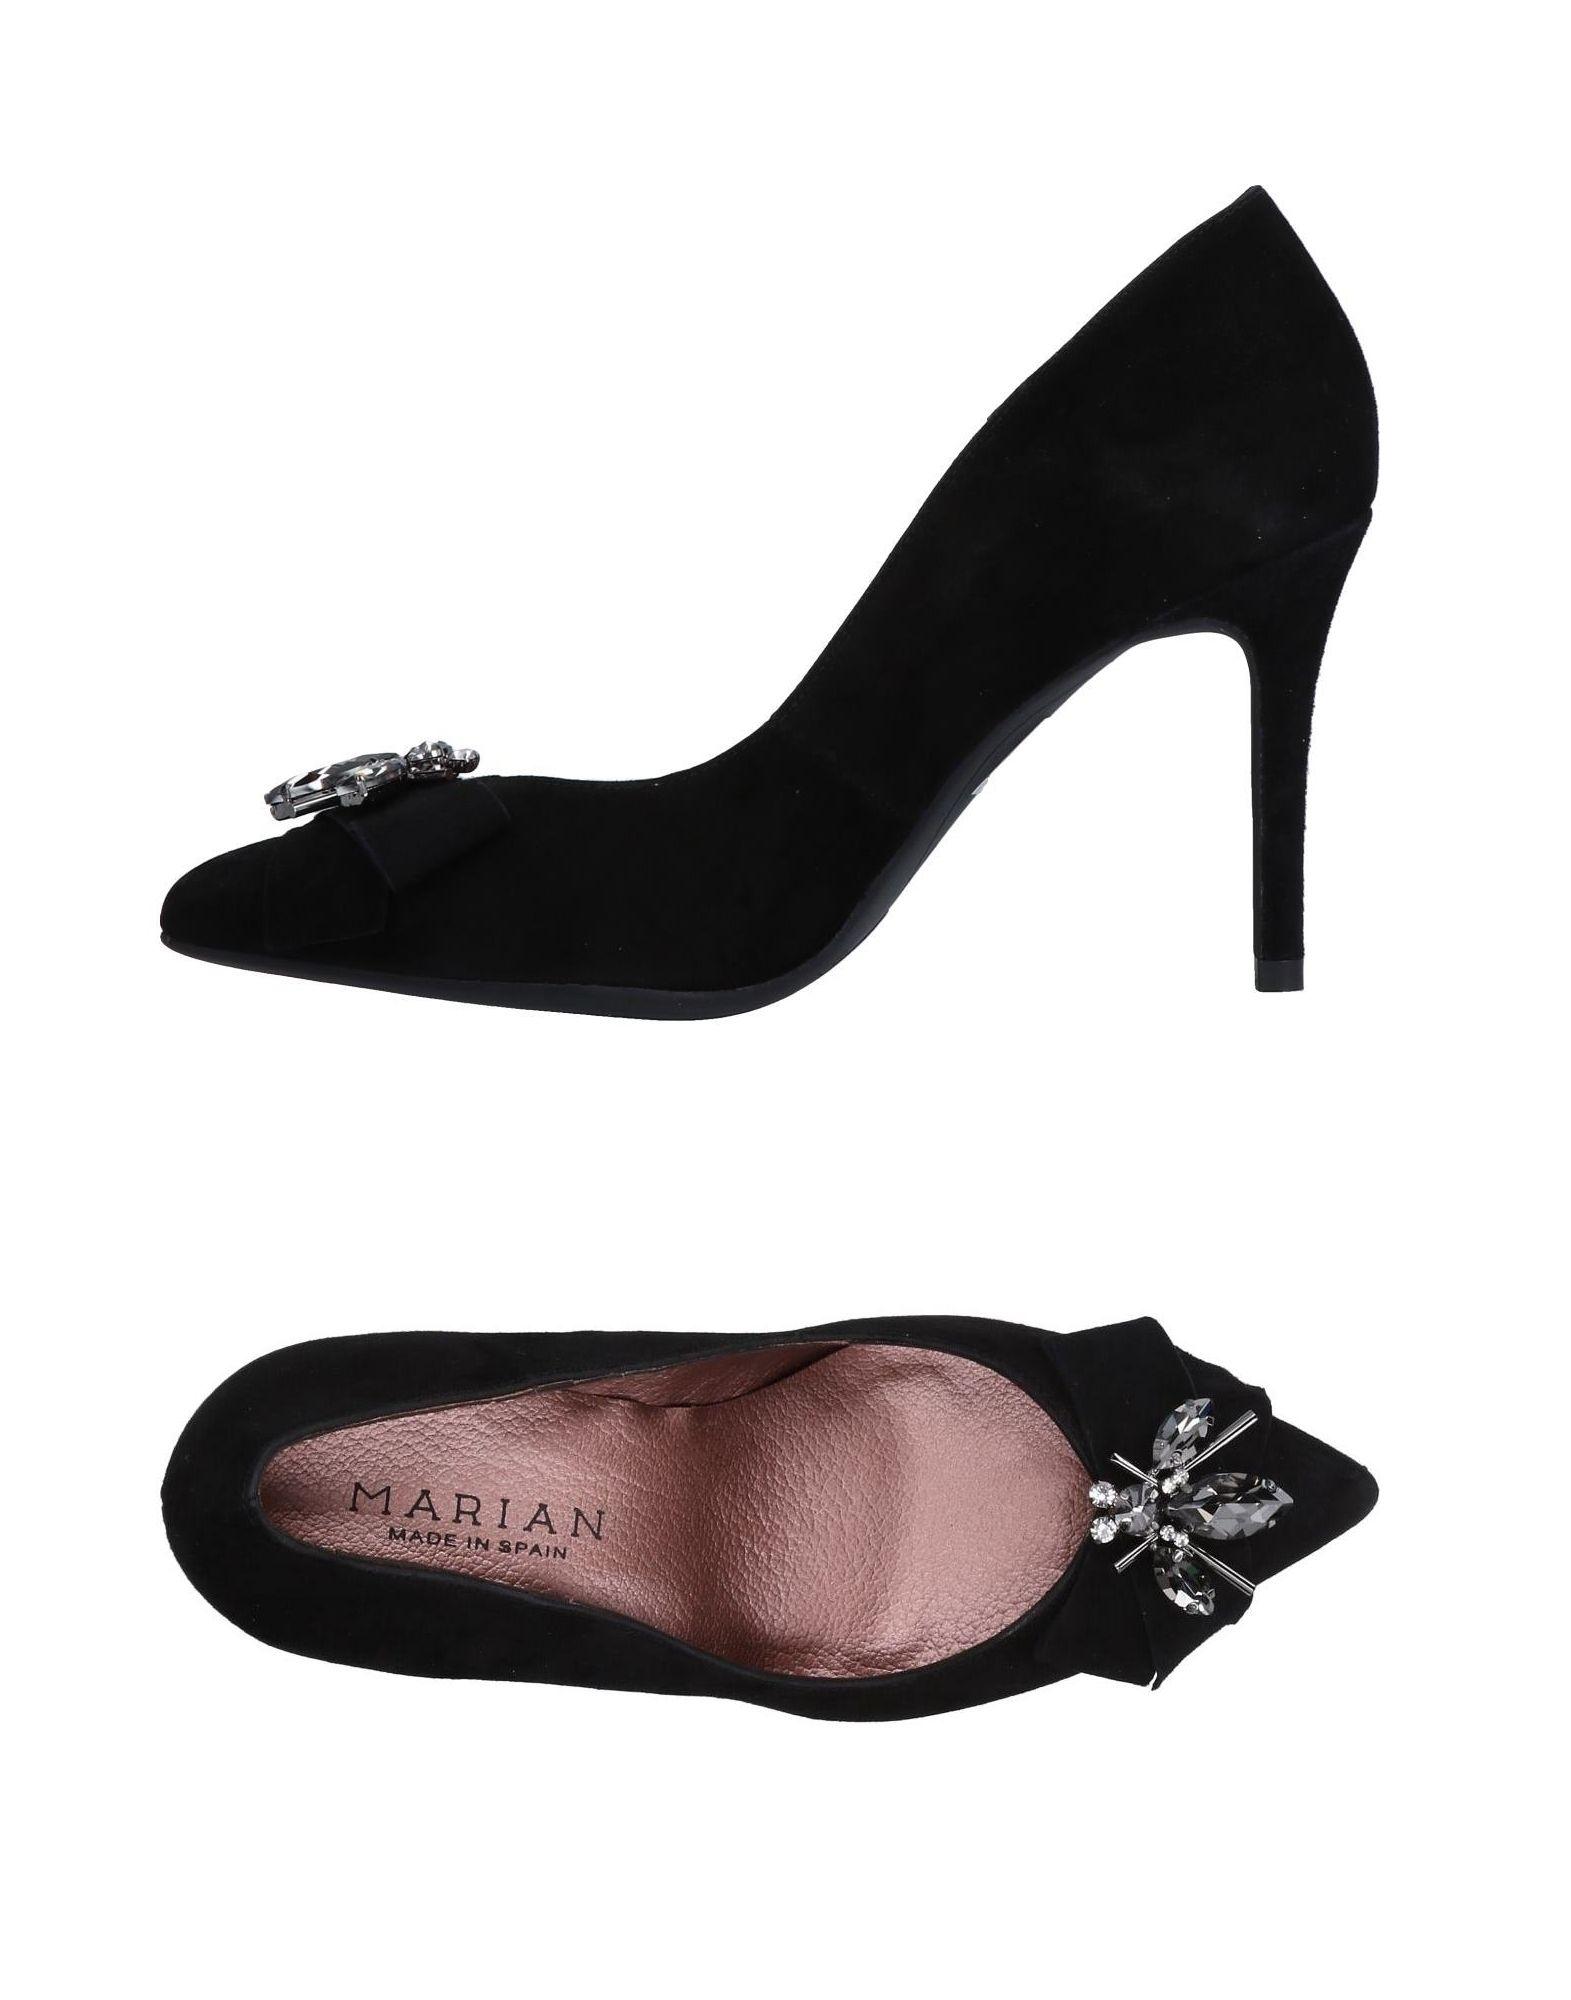 Sandali Fiorina offerte Donna - 11253740UI Nuove offerte Fiorina e scarpe comode 56b290